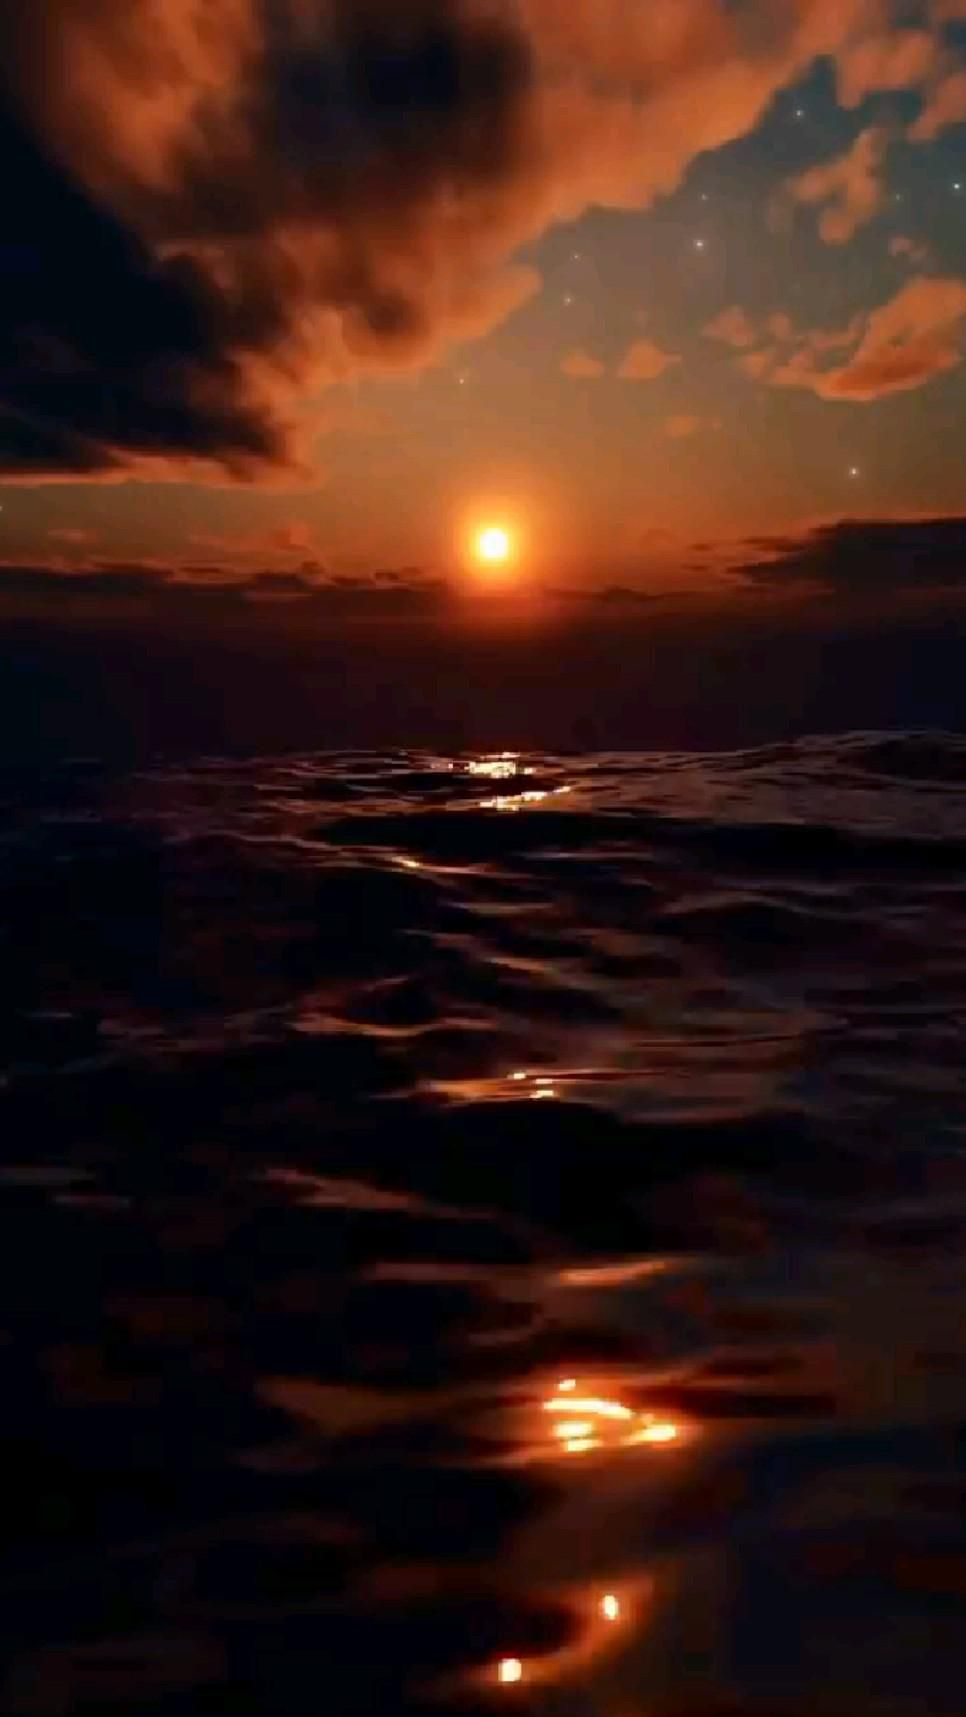 SUN RISE   MORNING POST   PEACEFUL MORNING   NATURE LOVE   MUSIC LOVE